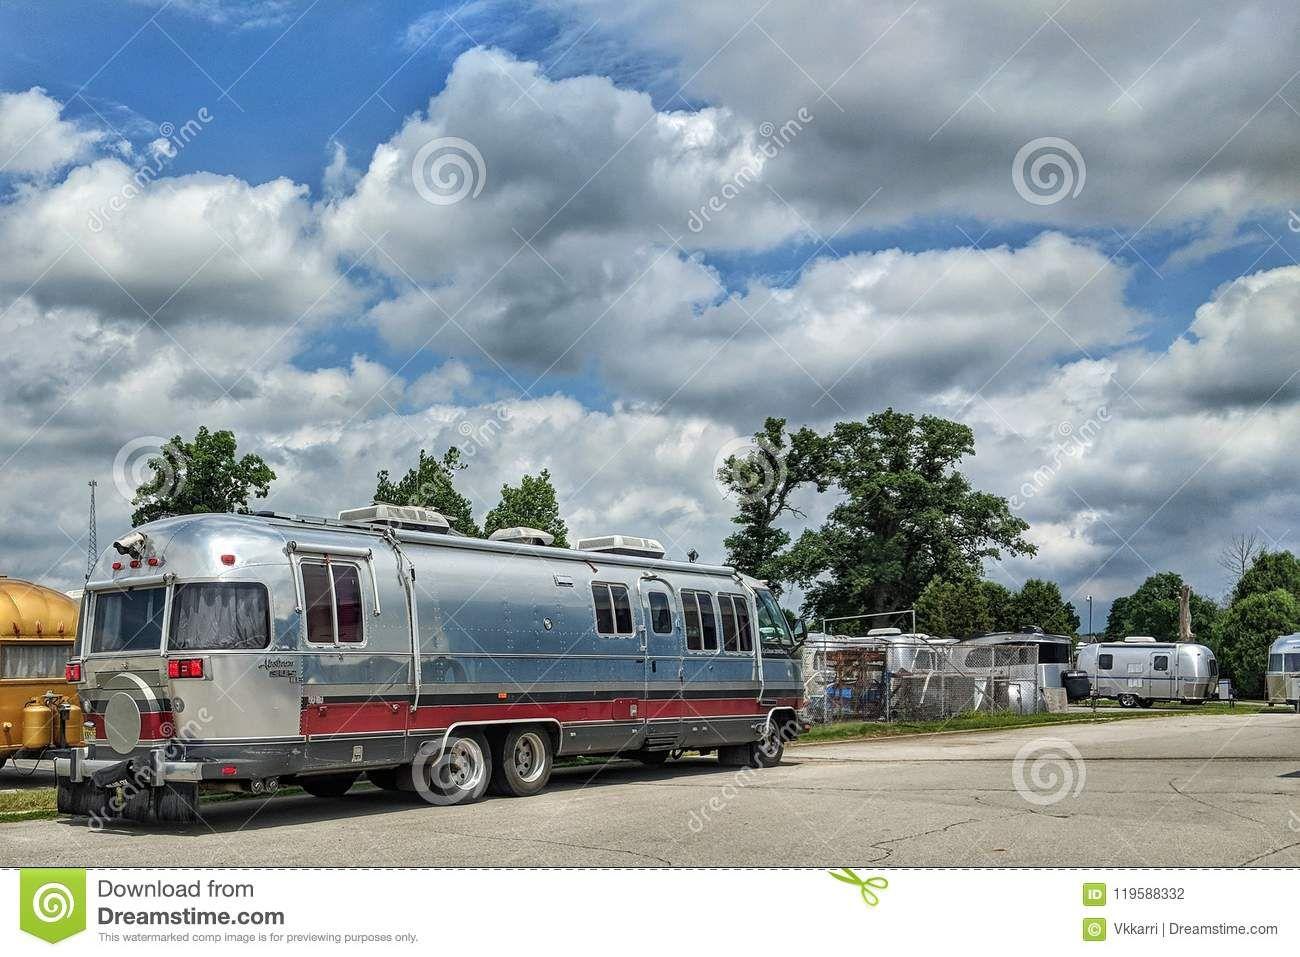 Airstream Travel Trailer Caravans In Parking Lot Editorial